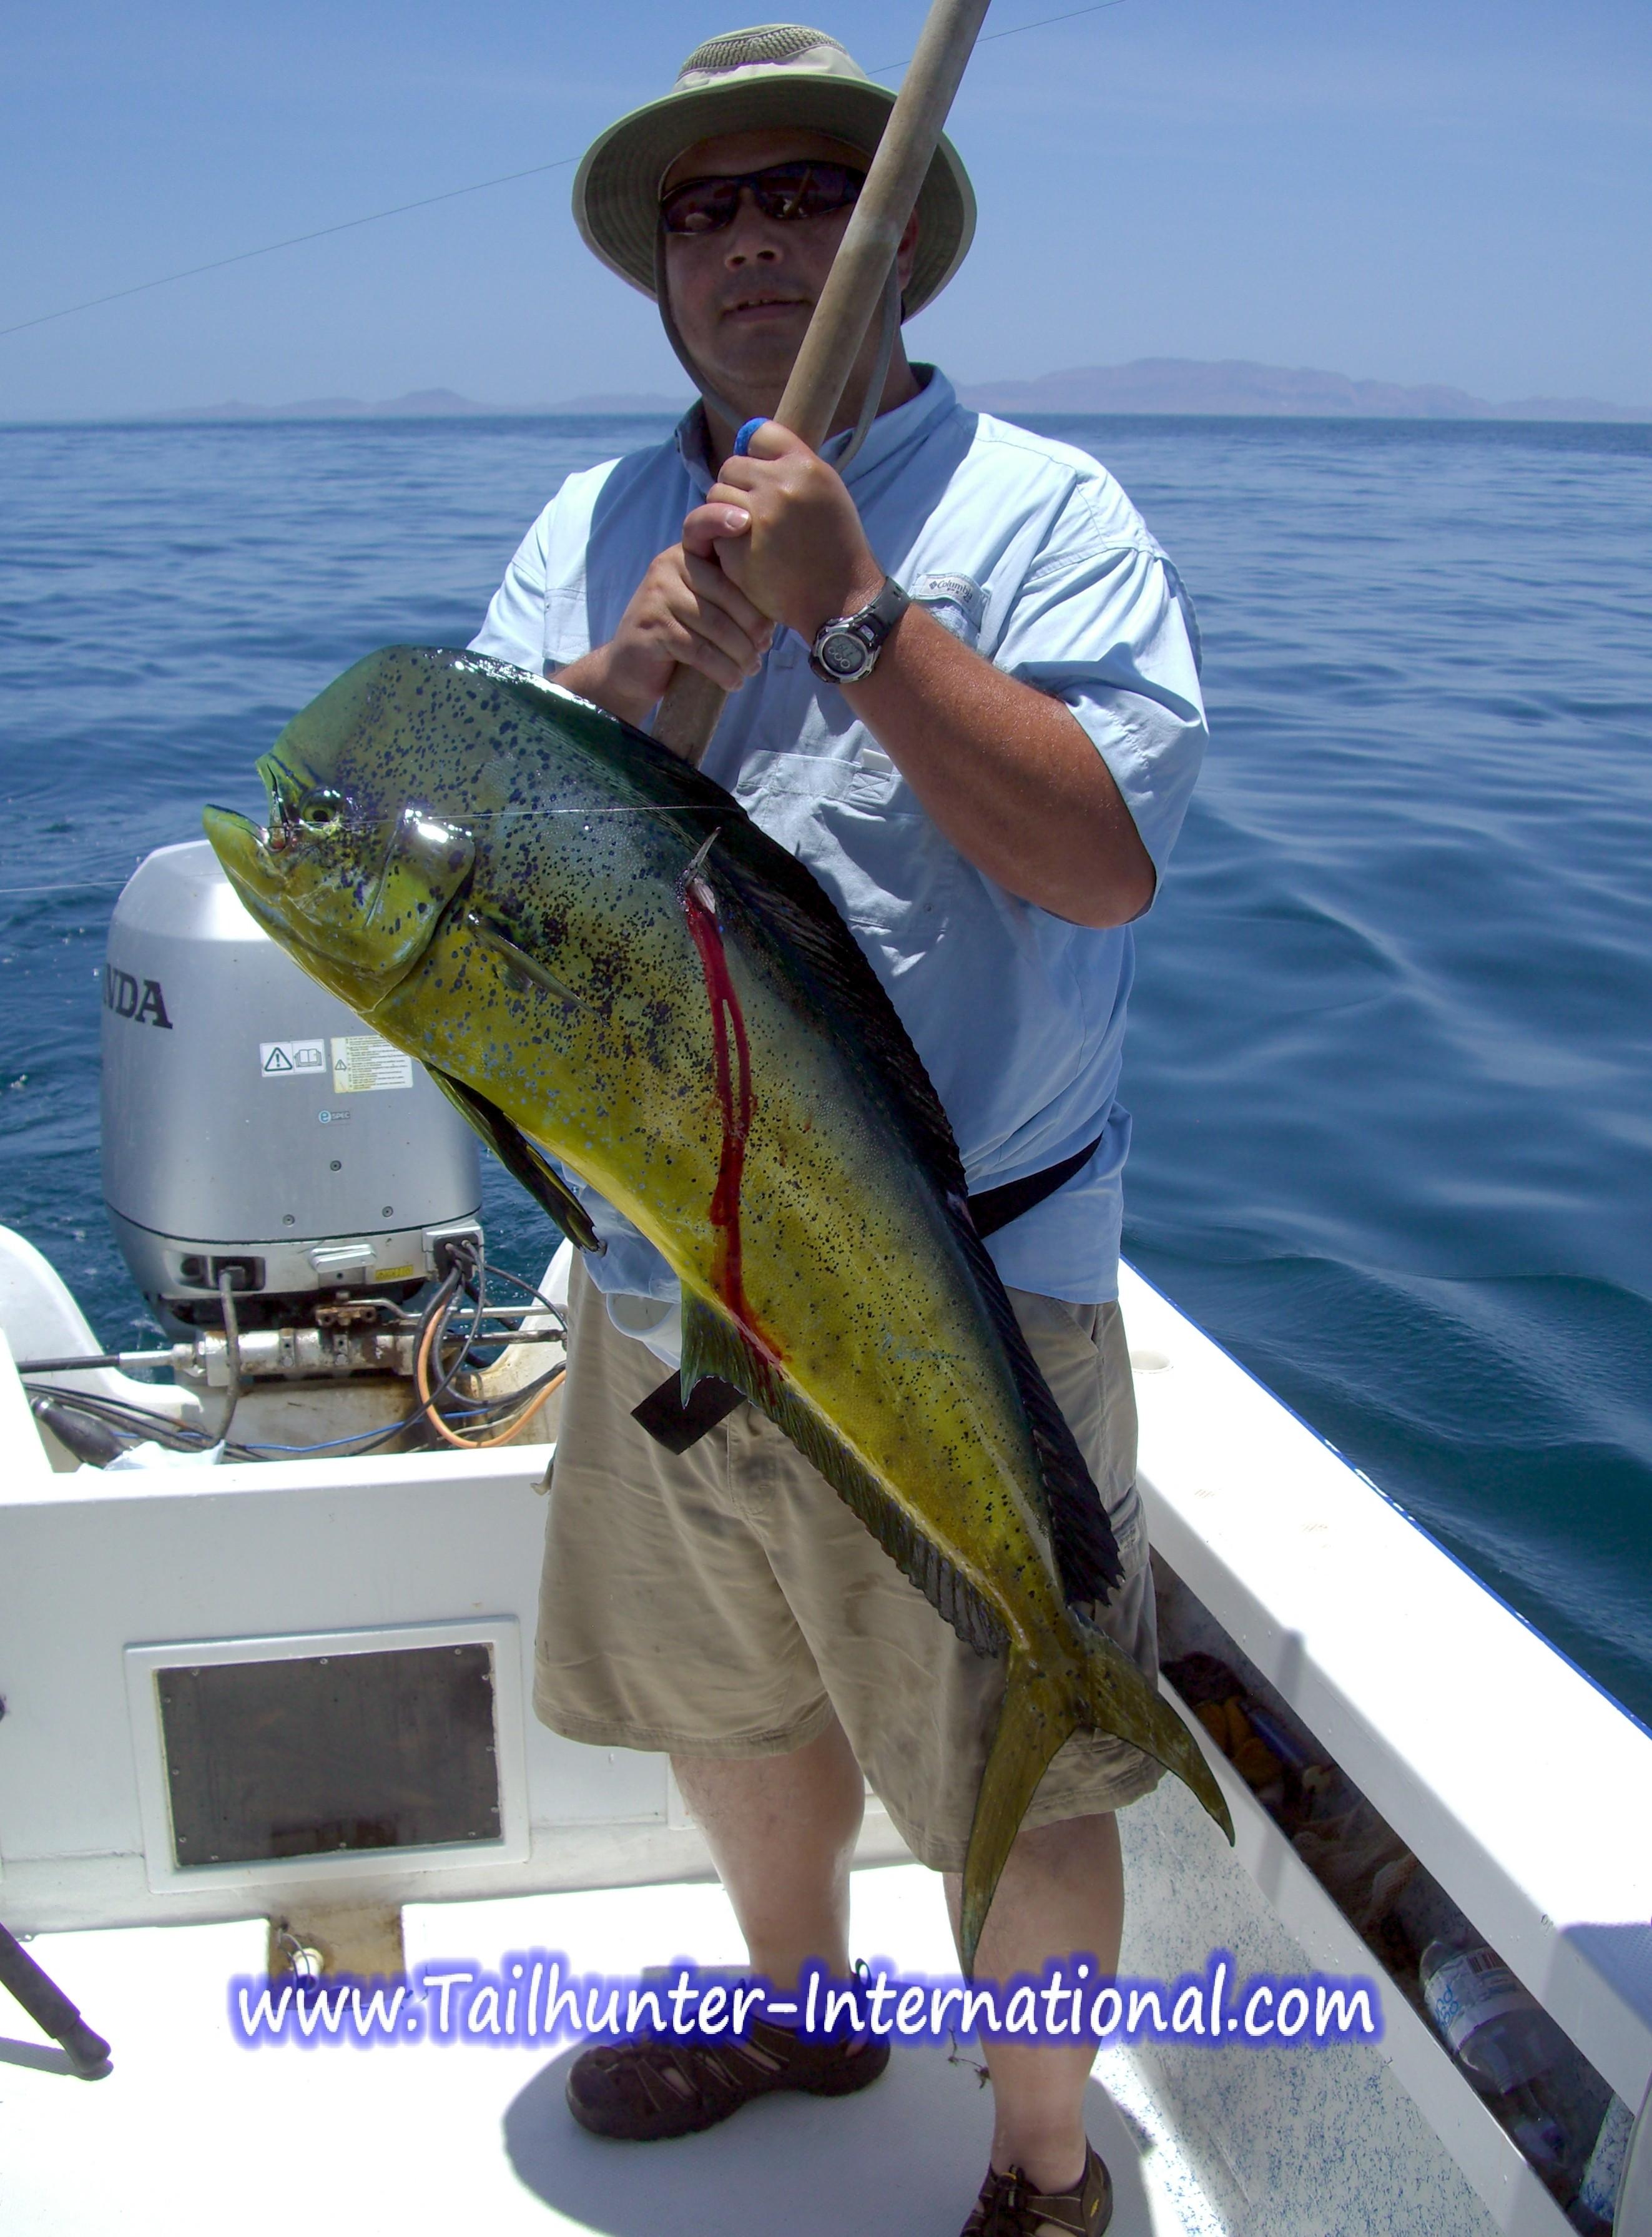 La paz las arenas june 24 july 1 for Salt lake city fishing